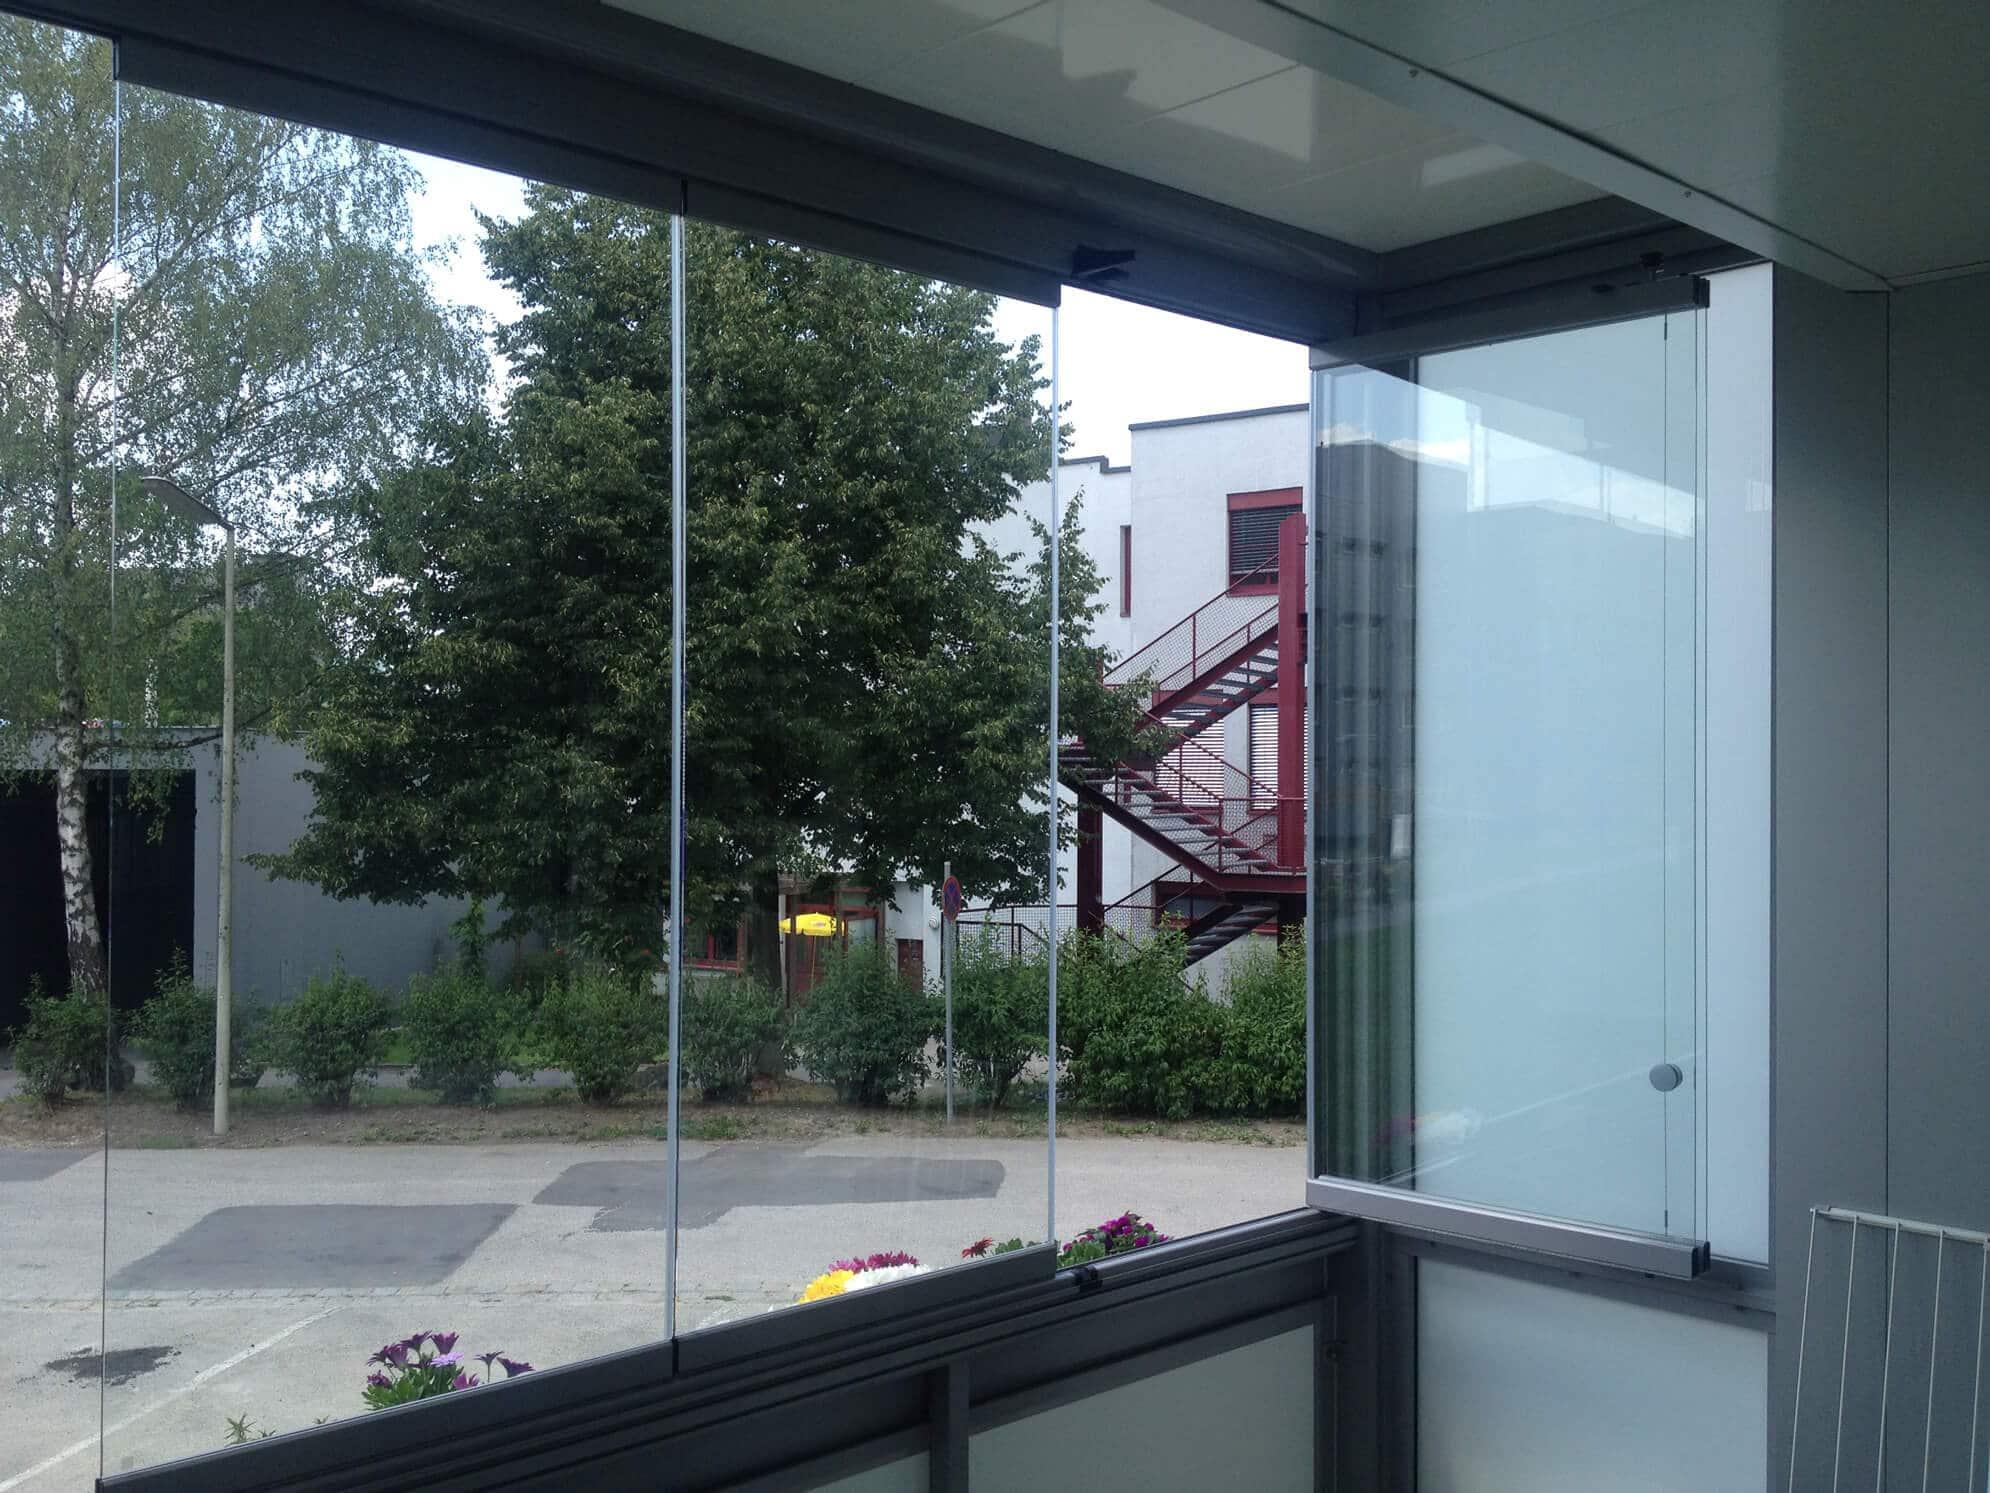 Balkonverbau mit Faltwand aus Glas